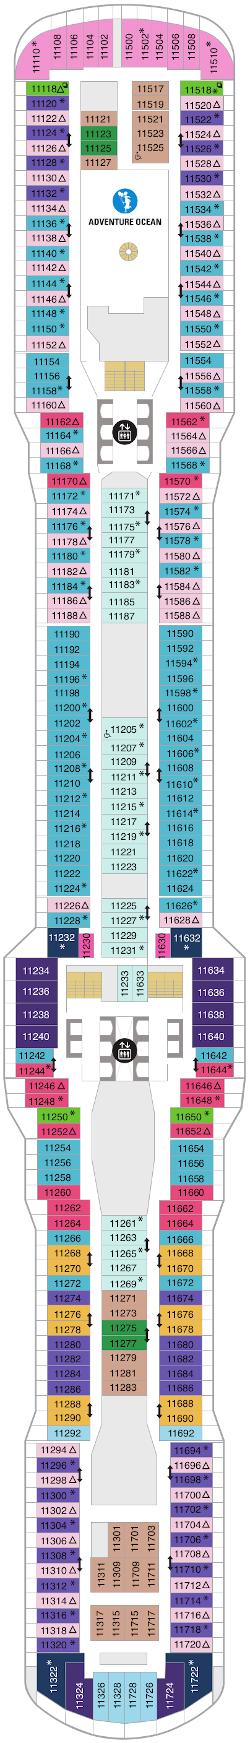 Spectrum Of The Seas Deck Eleven Deck Plan